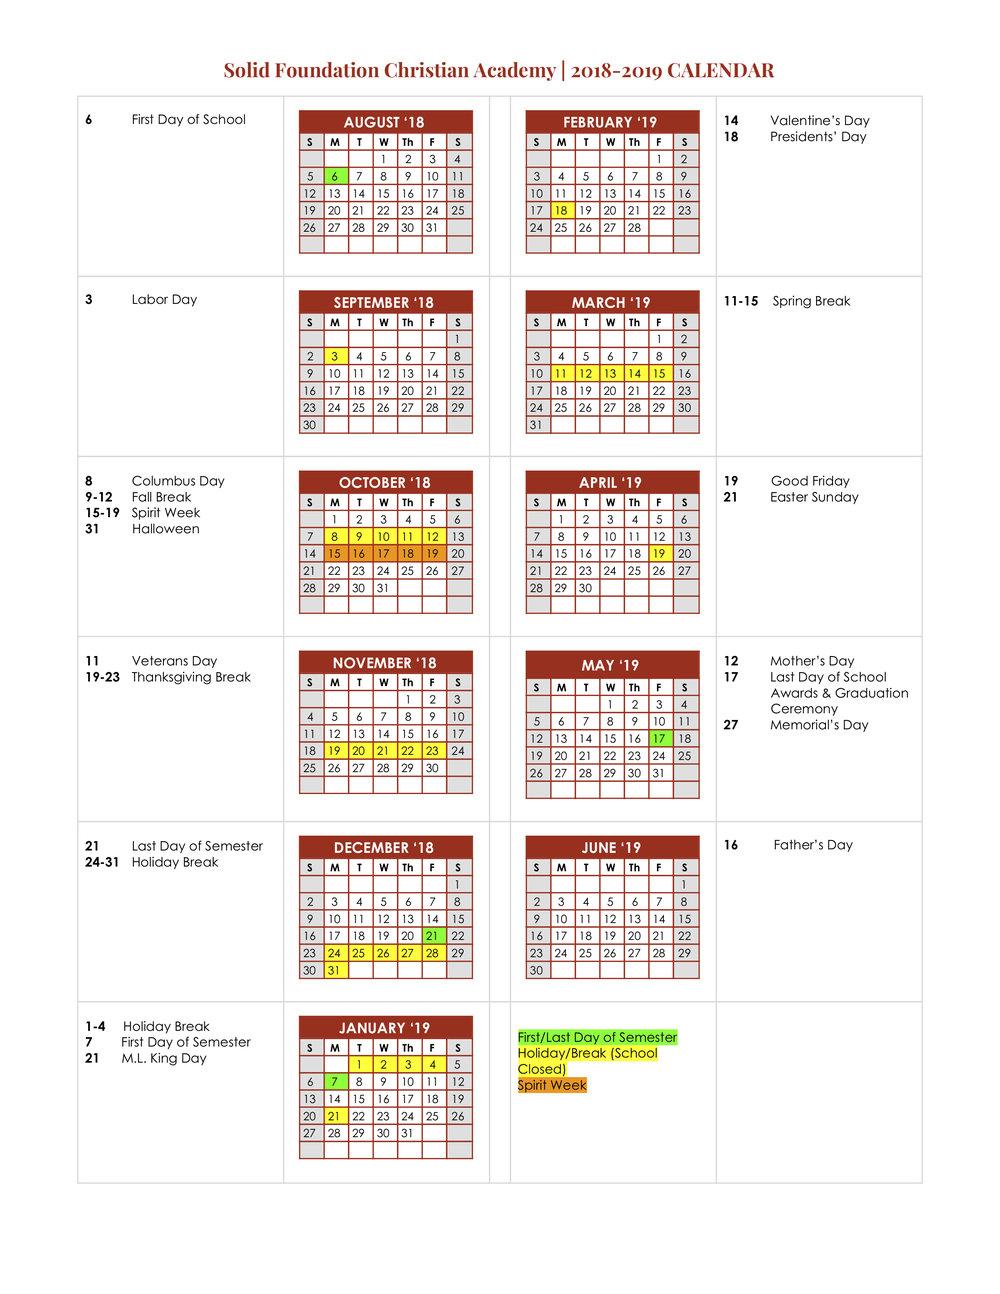 SFCA 2018-2019 School Calendar.jpg